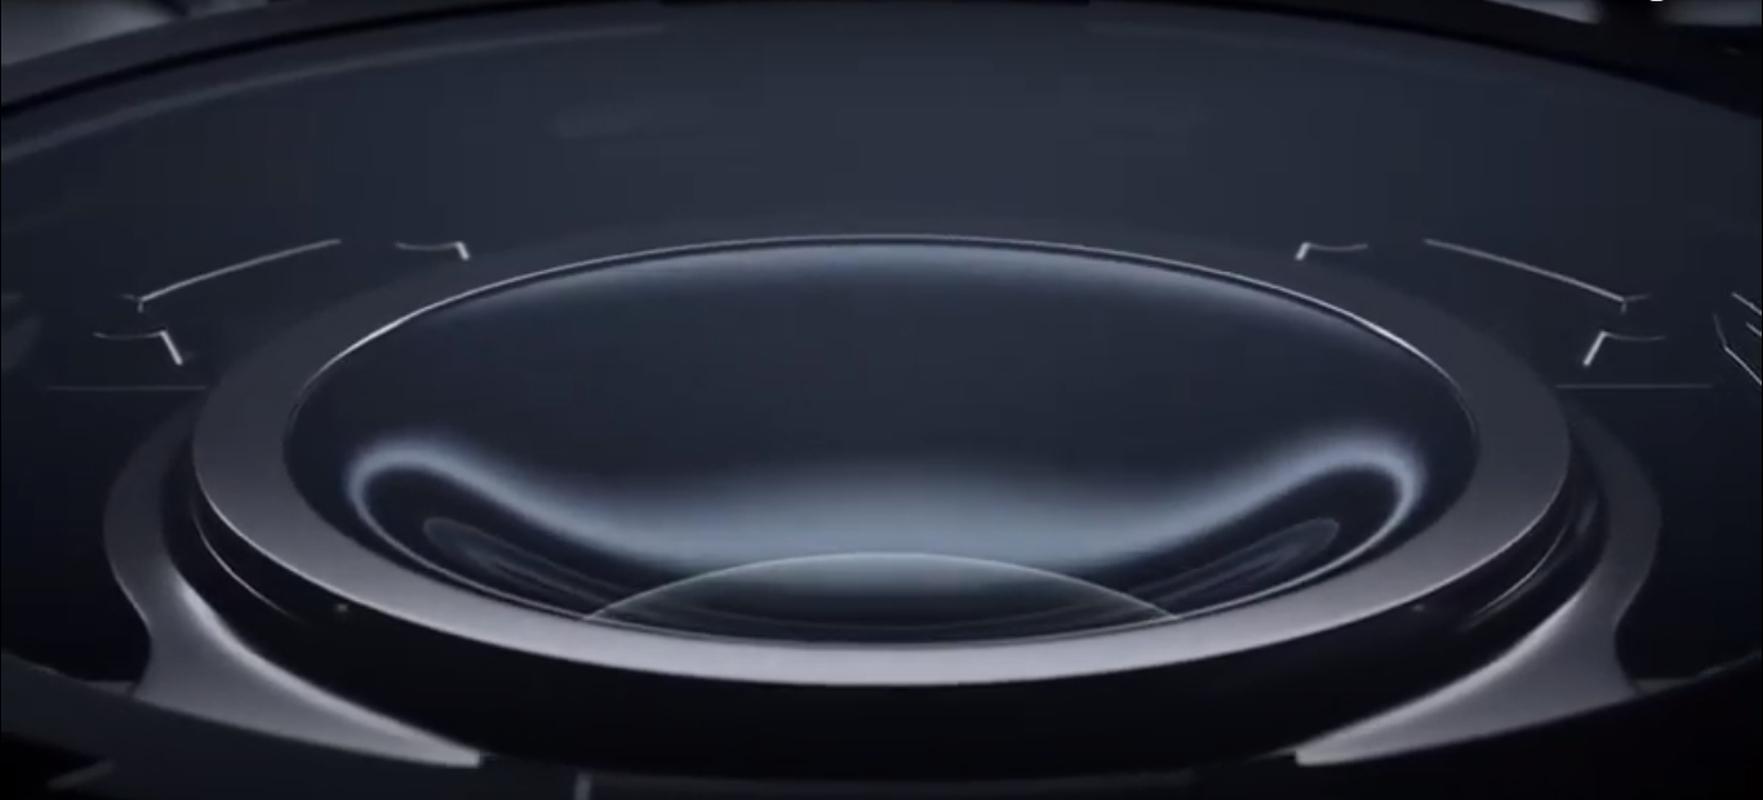 Zmení technológia Liquid Lens svet mobilnej fotografie?